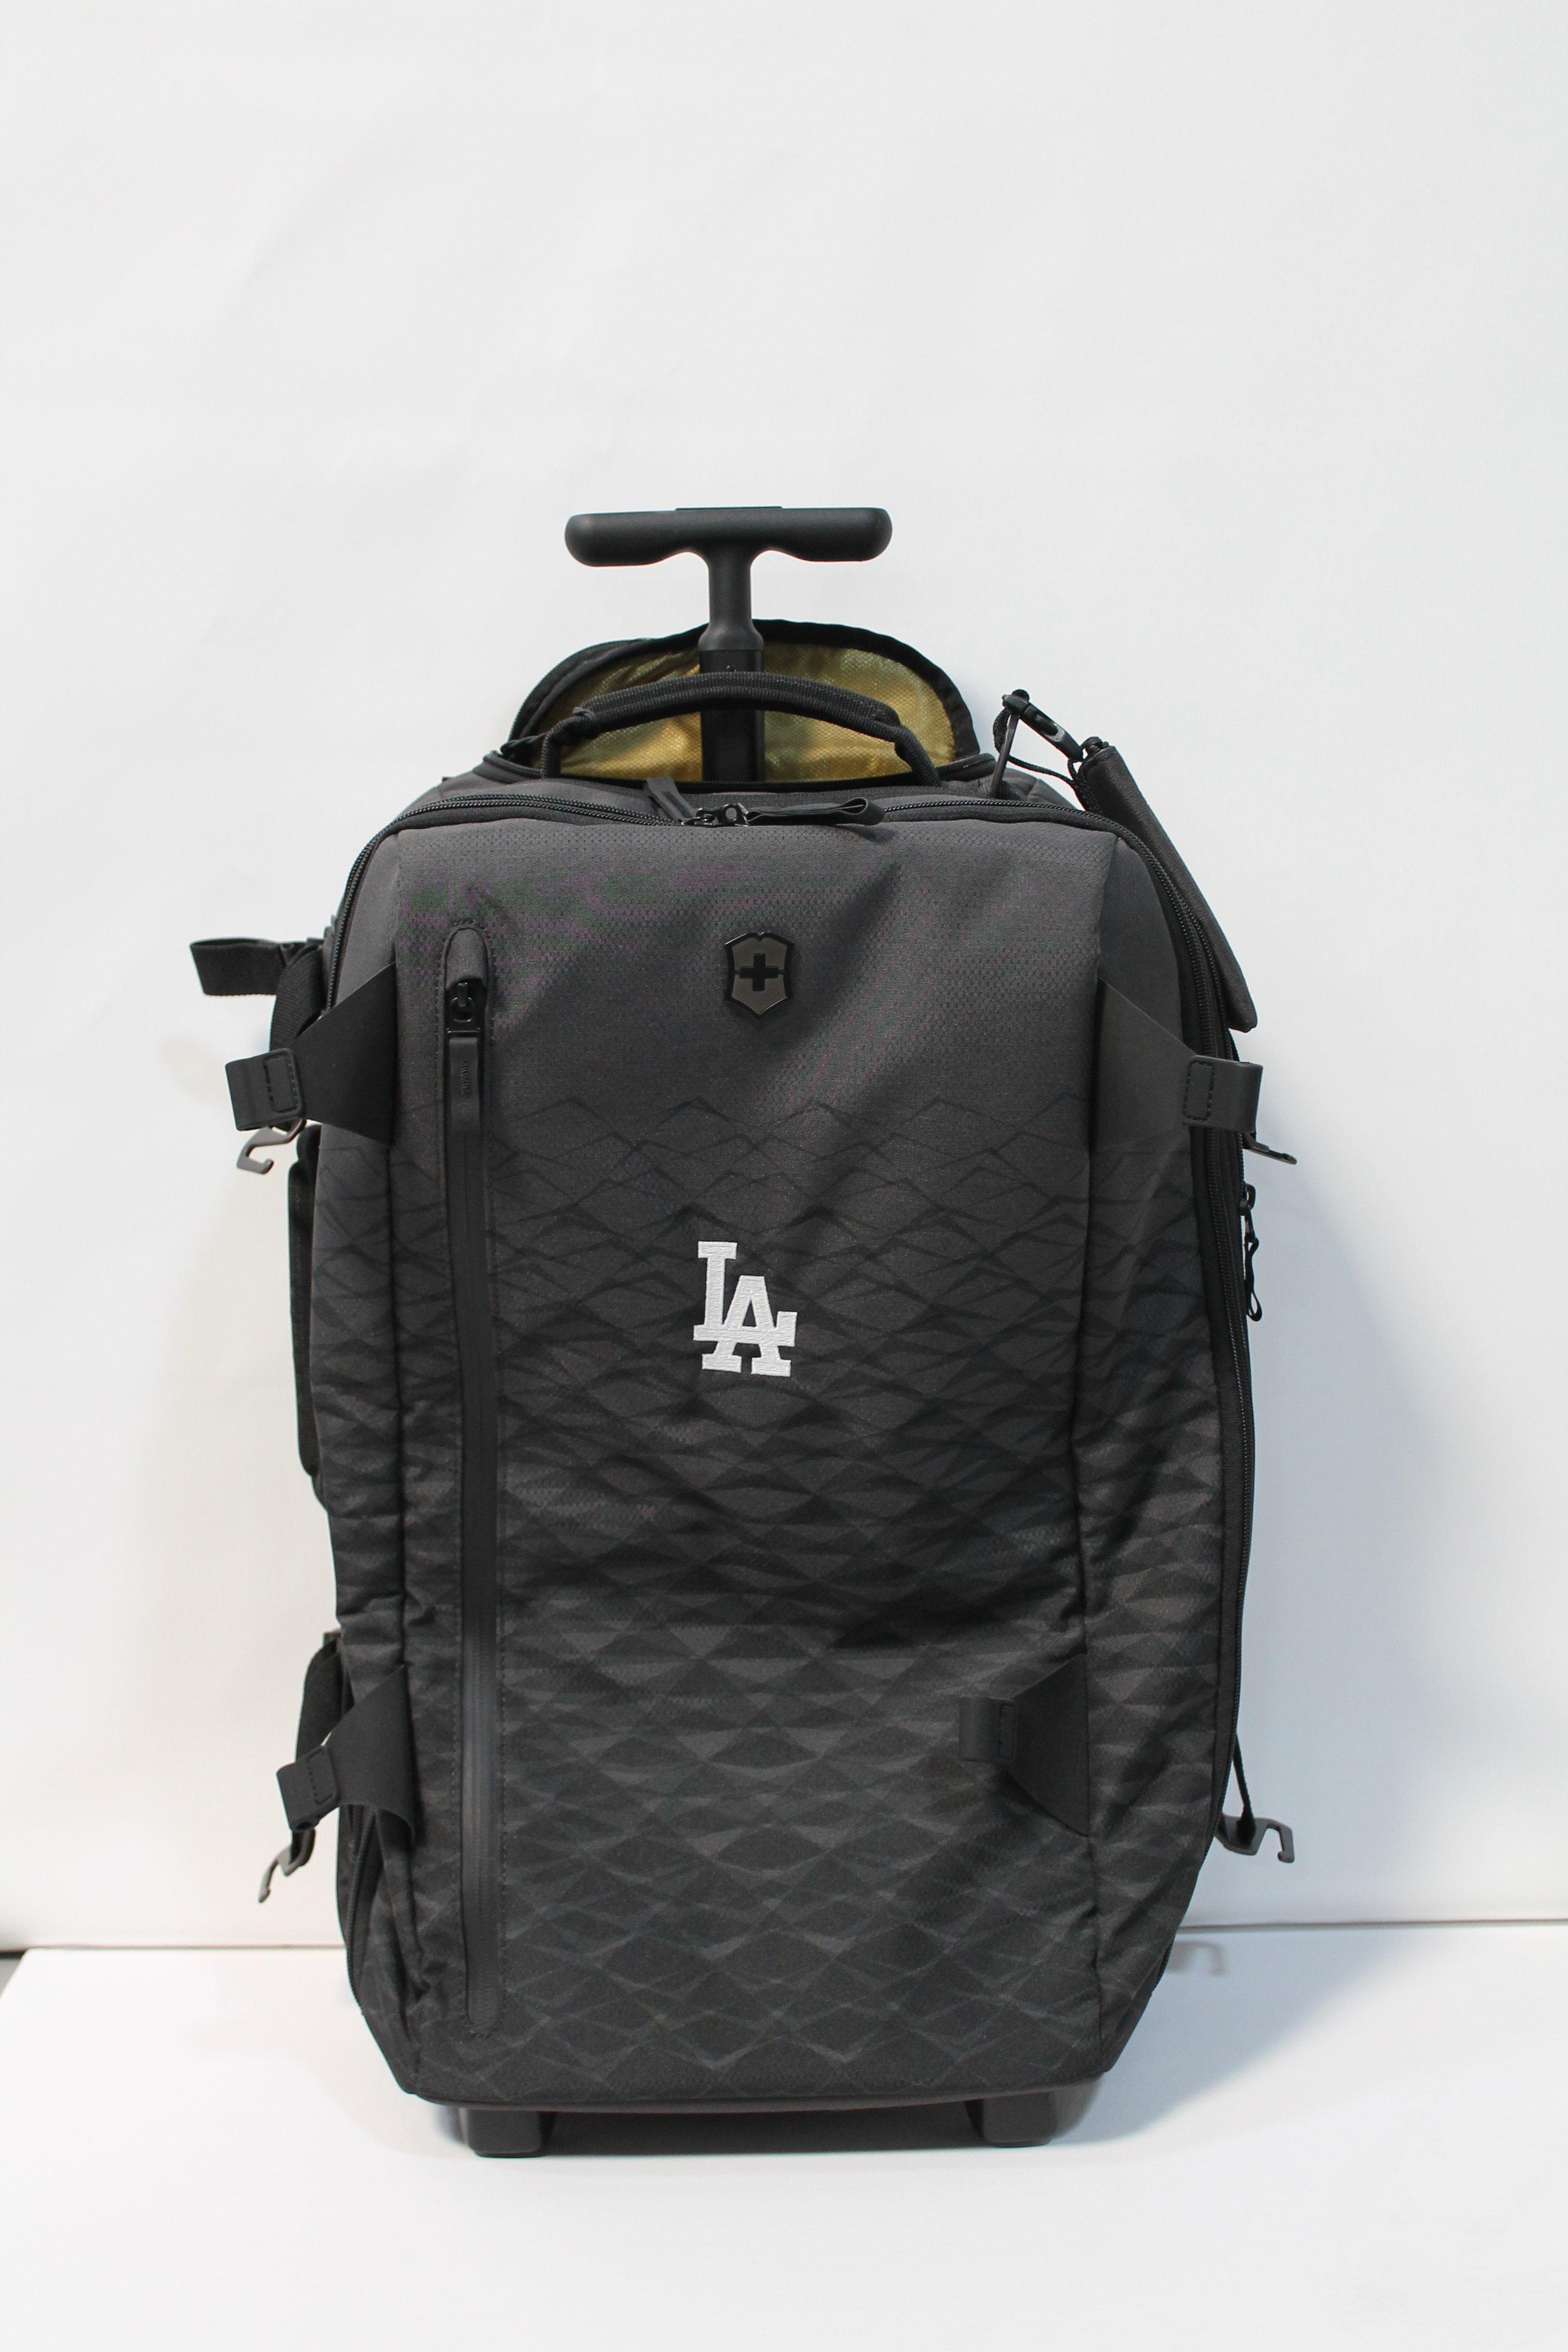 LA_Suitcase.JPG